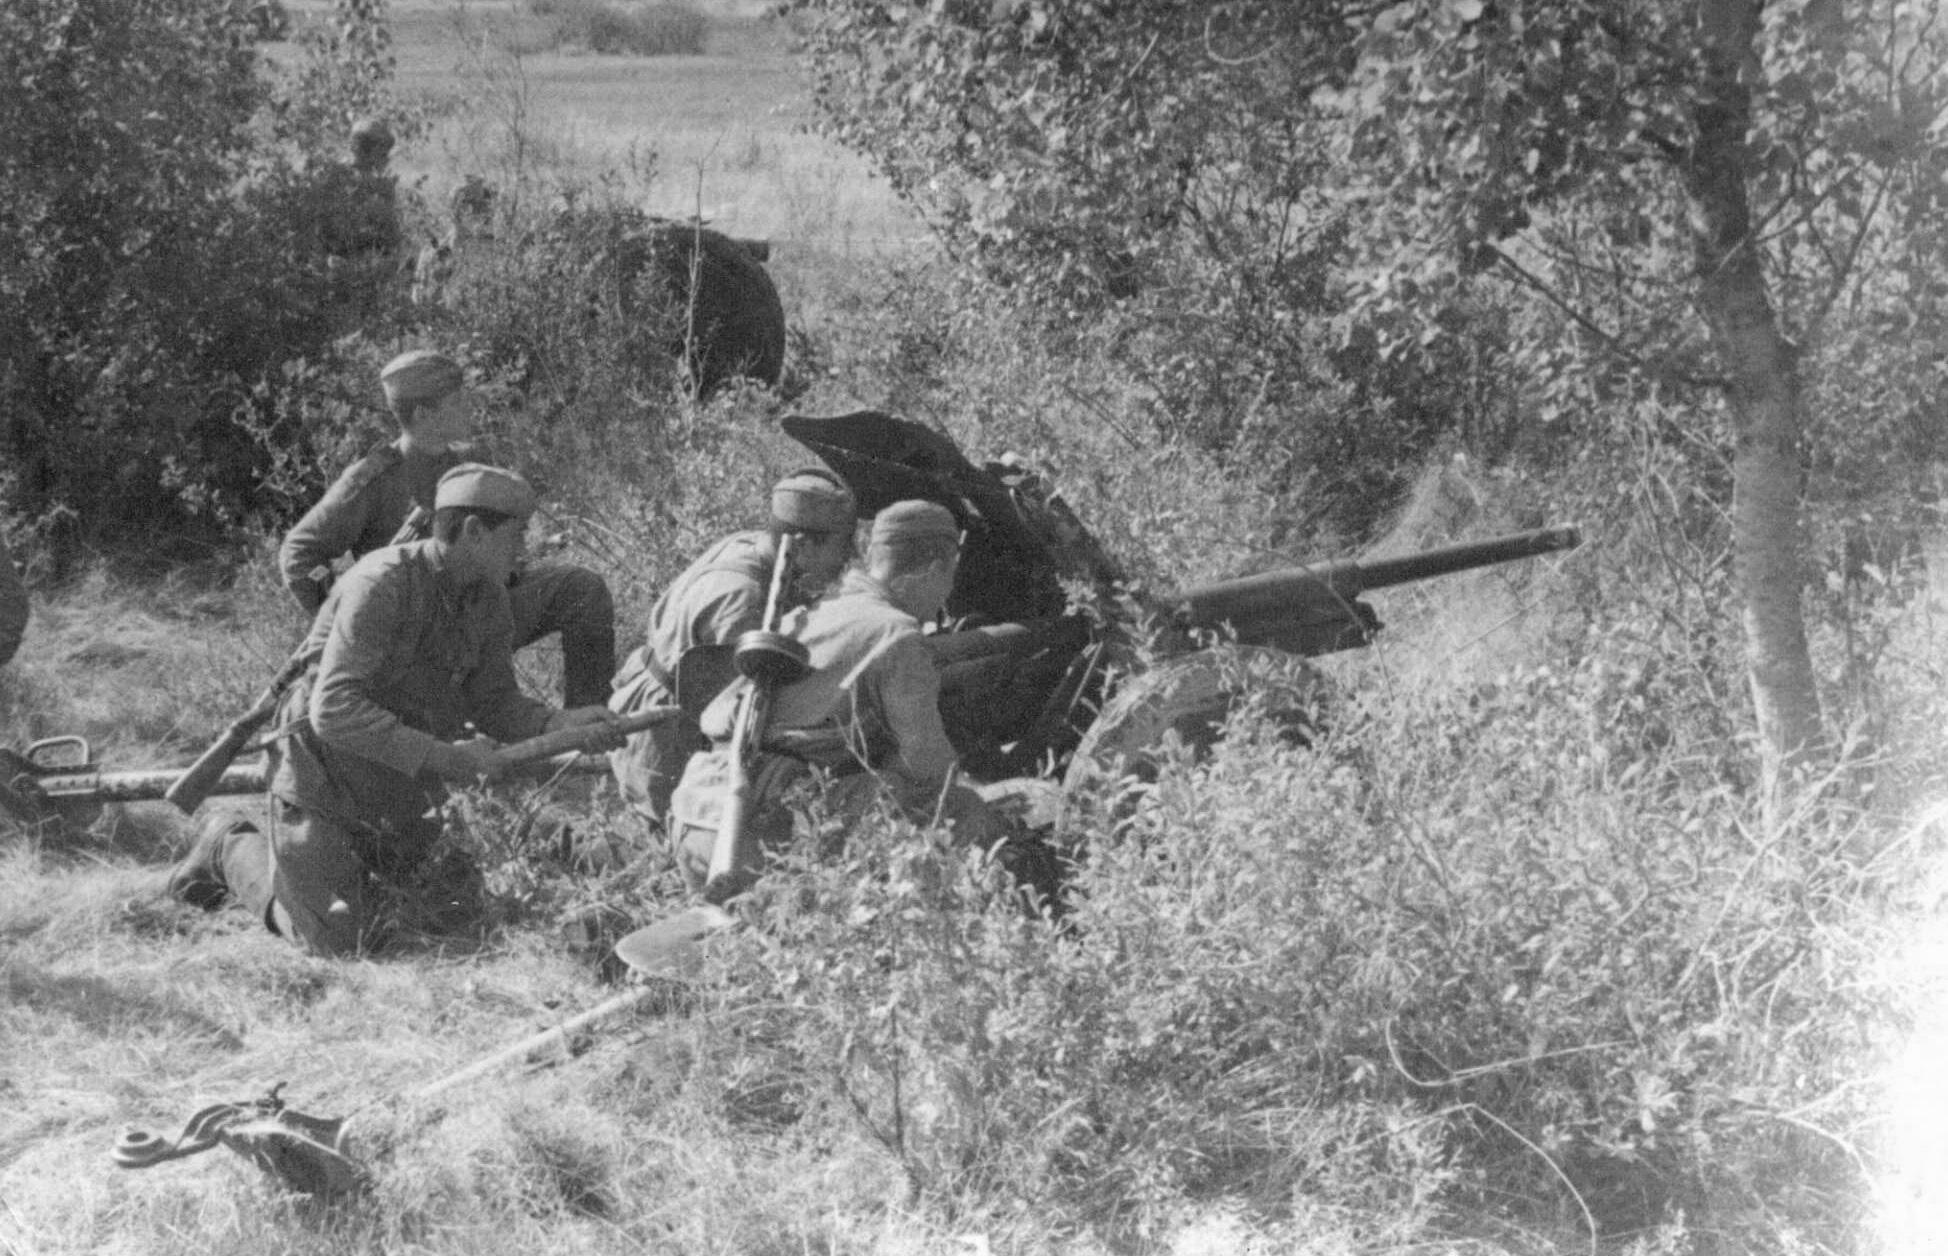 Фото 45-мм противотанковая пушка, 1943 г.